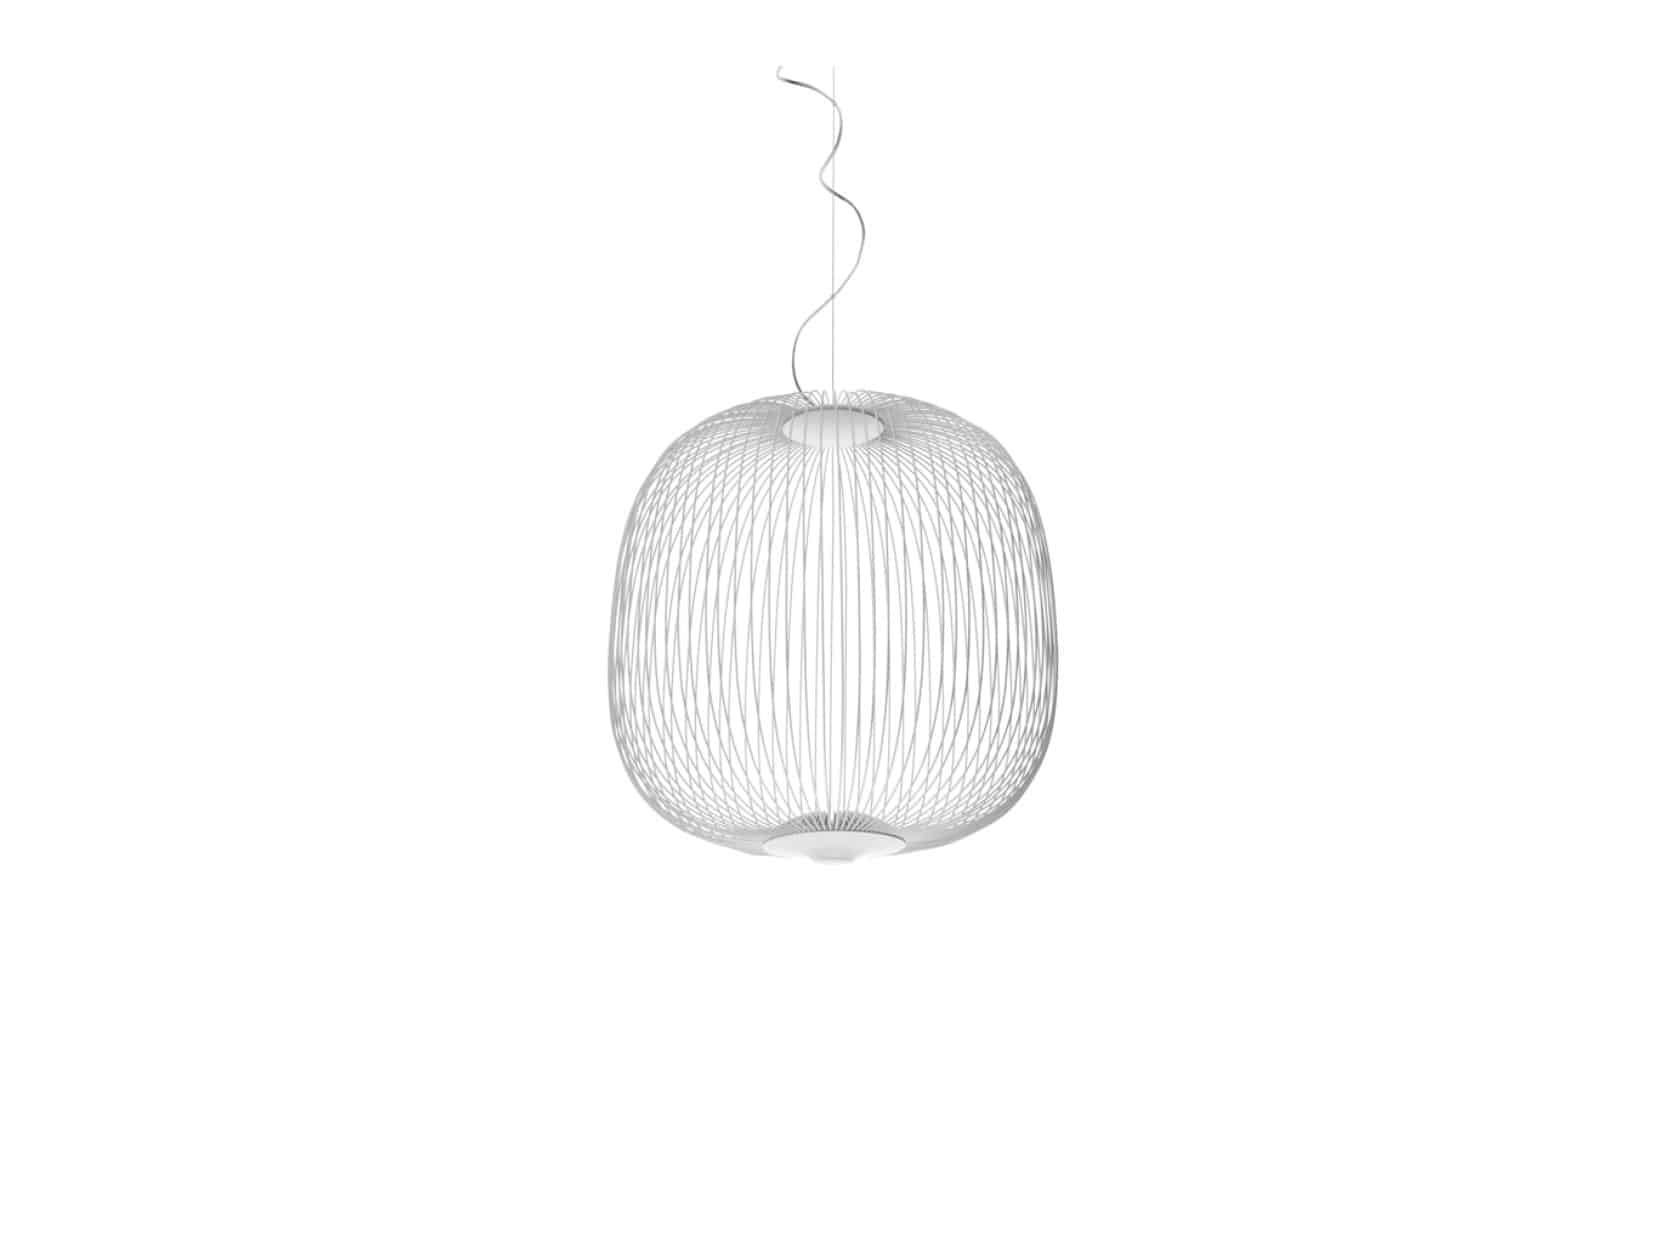 Foscarini hanglamp Spokes2